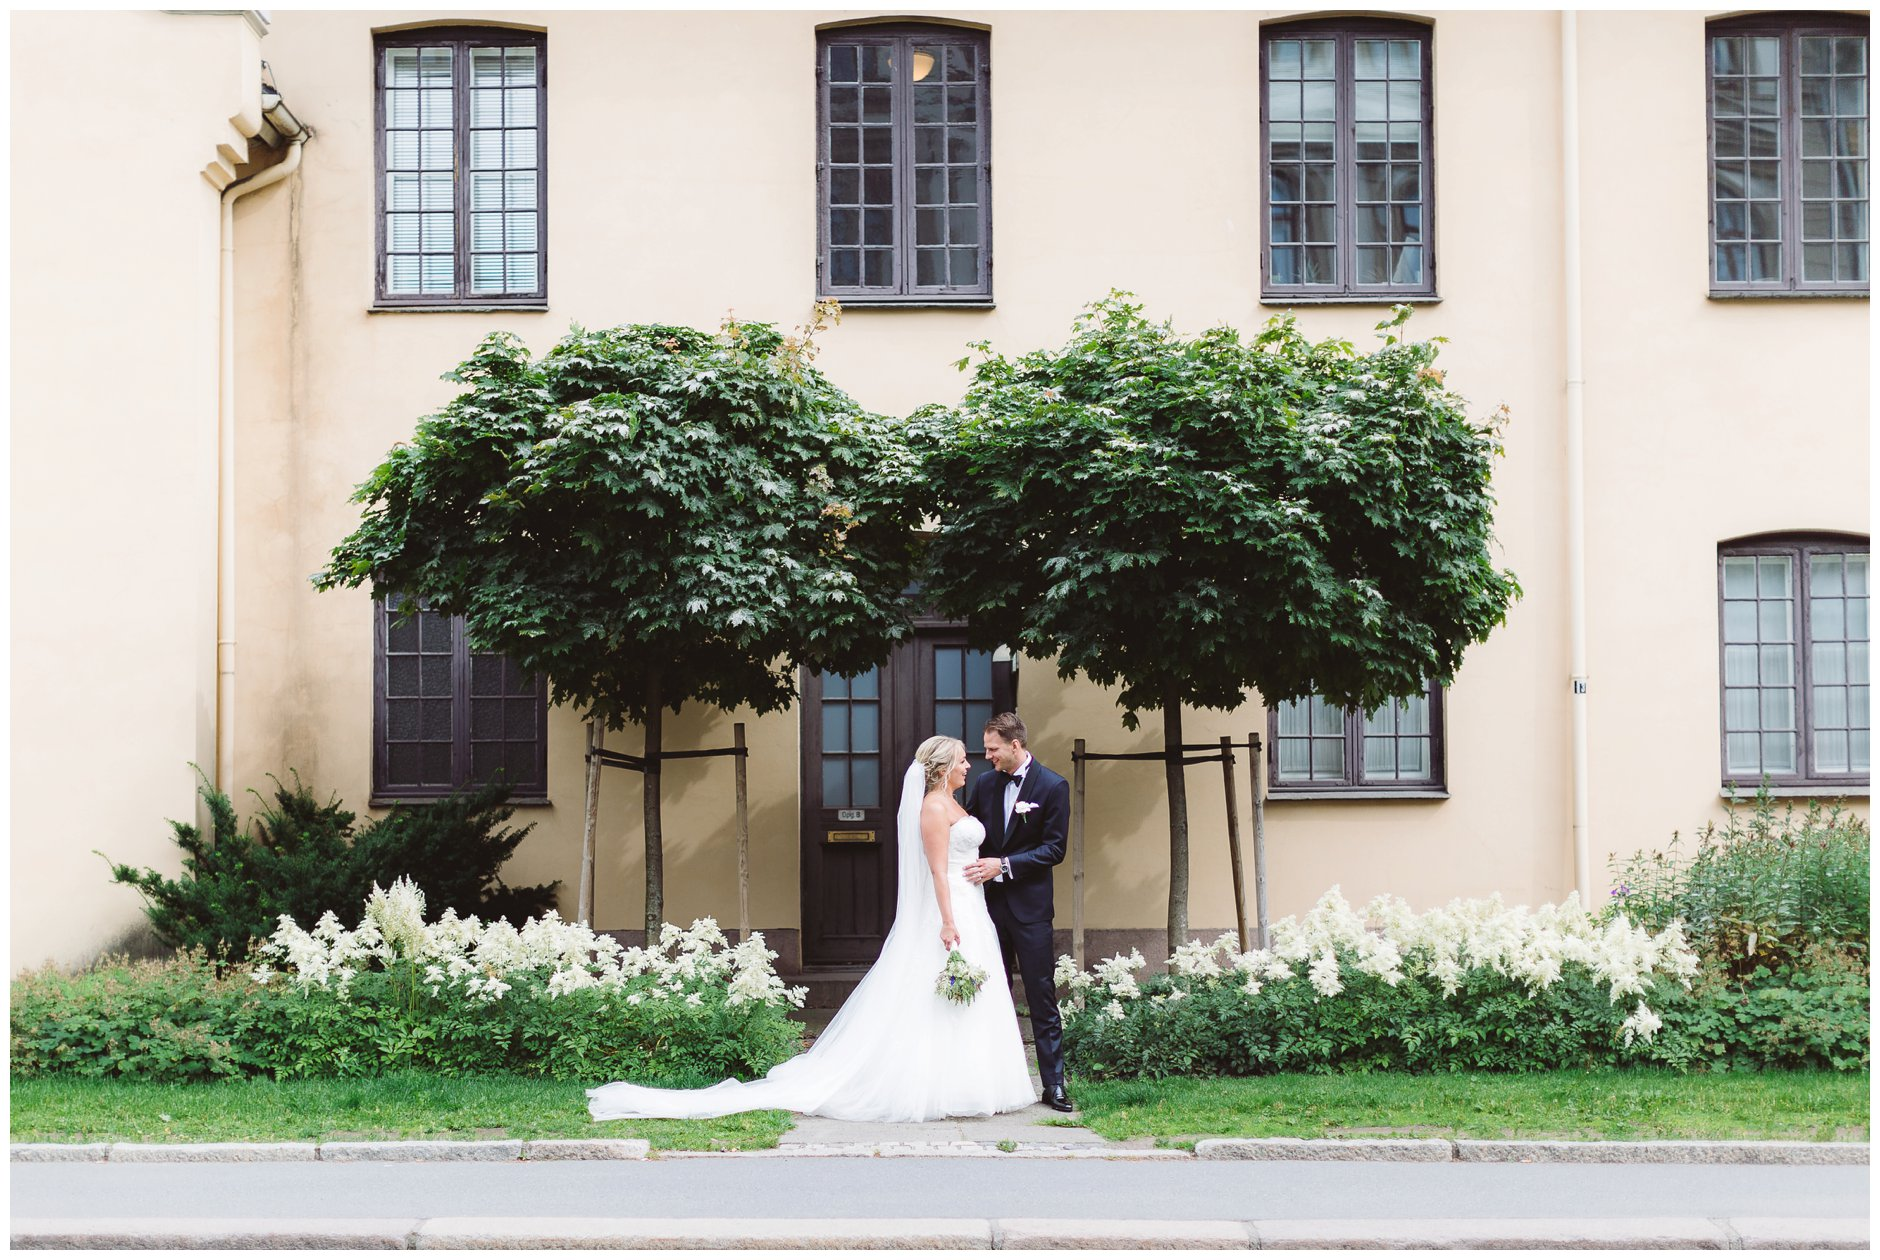 Fotograf-Eline-Jacobine-Bryllup-Villa-Eckbo-Fagerborg-kirke-The-Thief-Oslo_0129